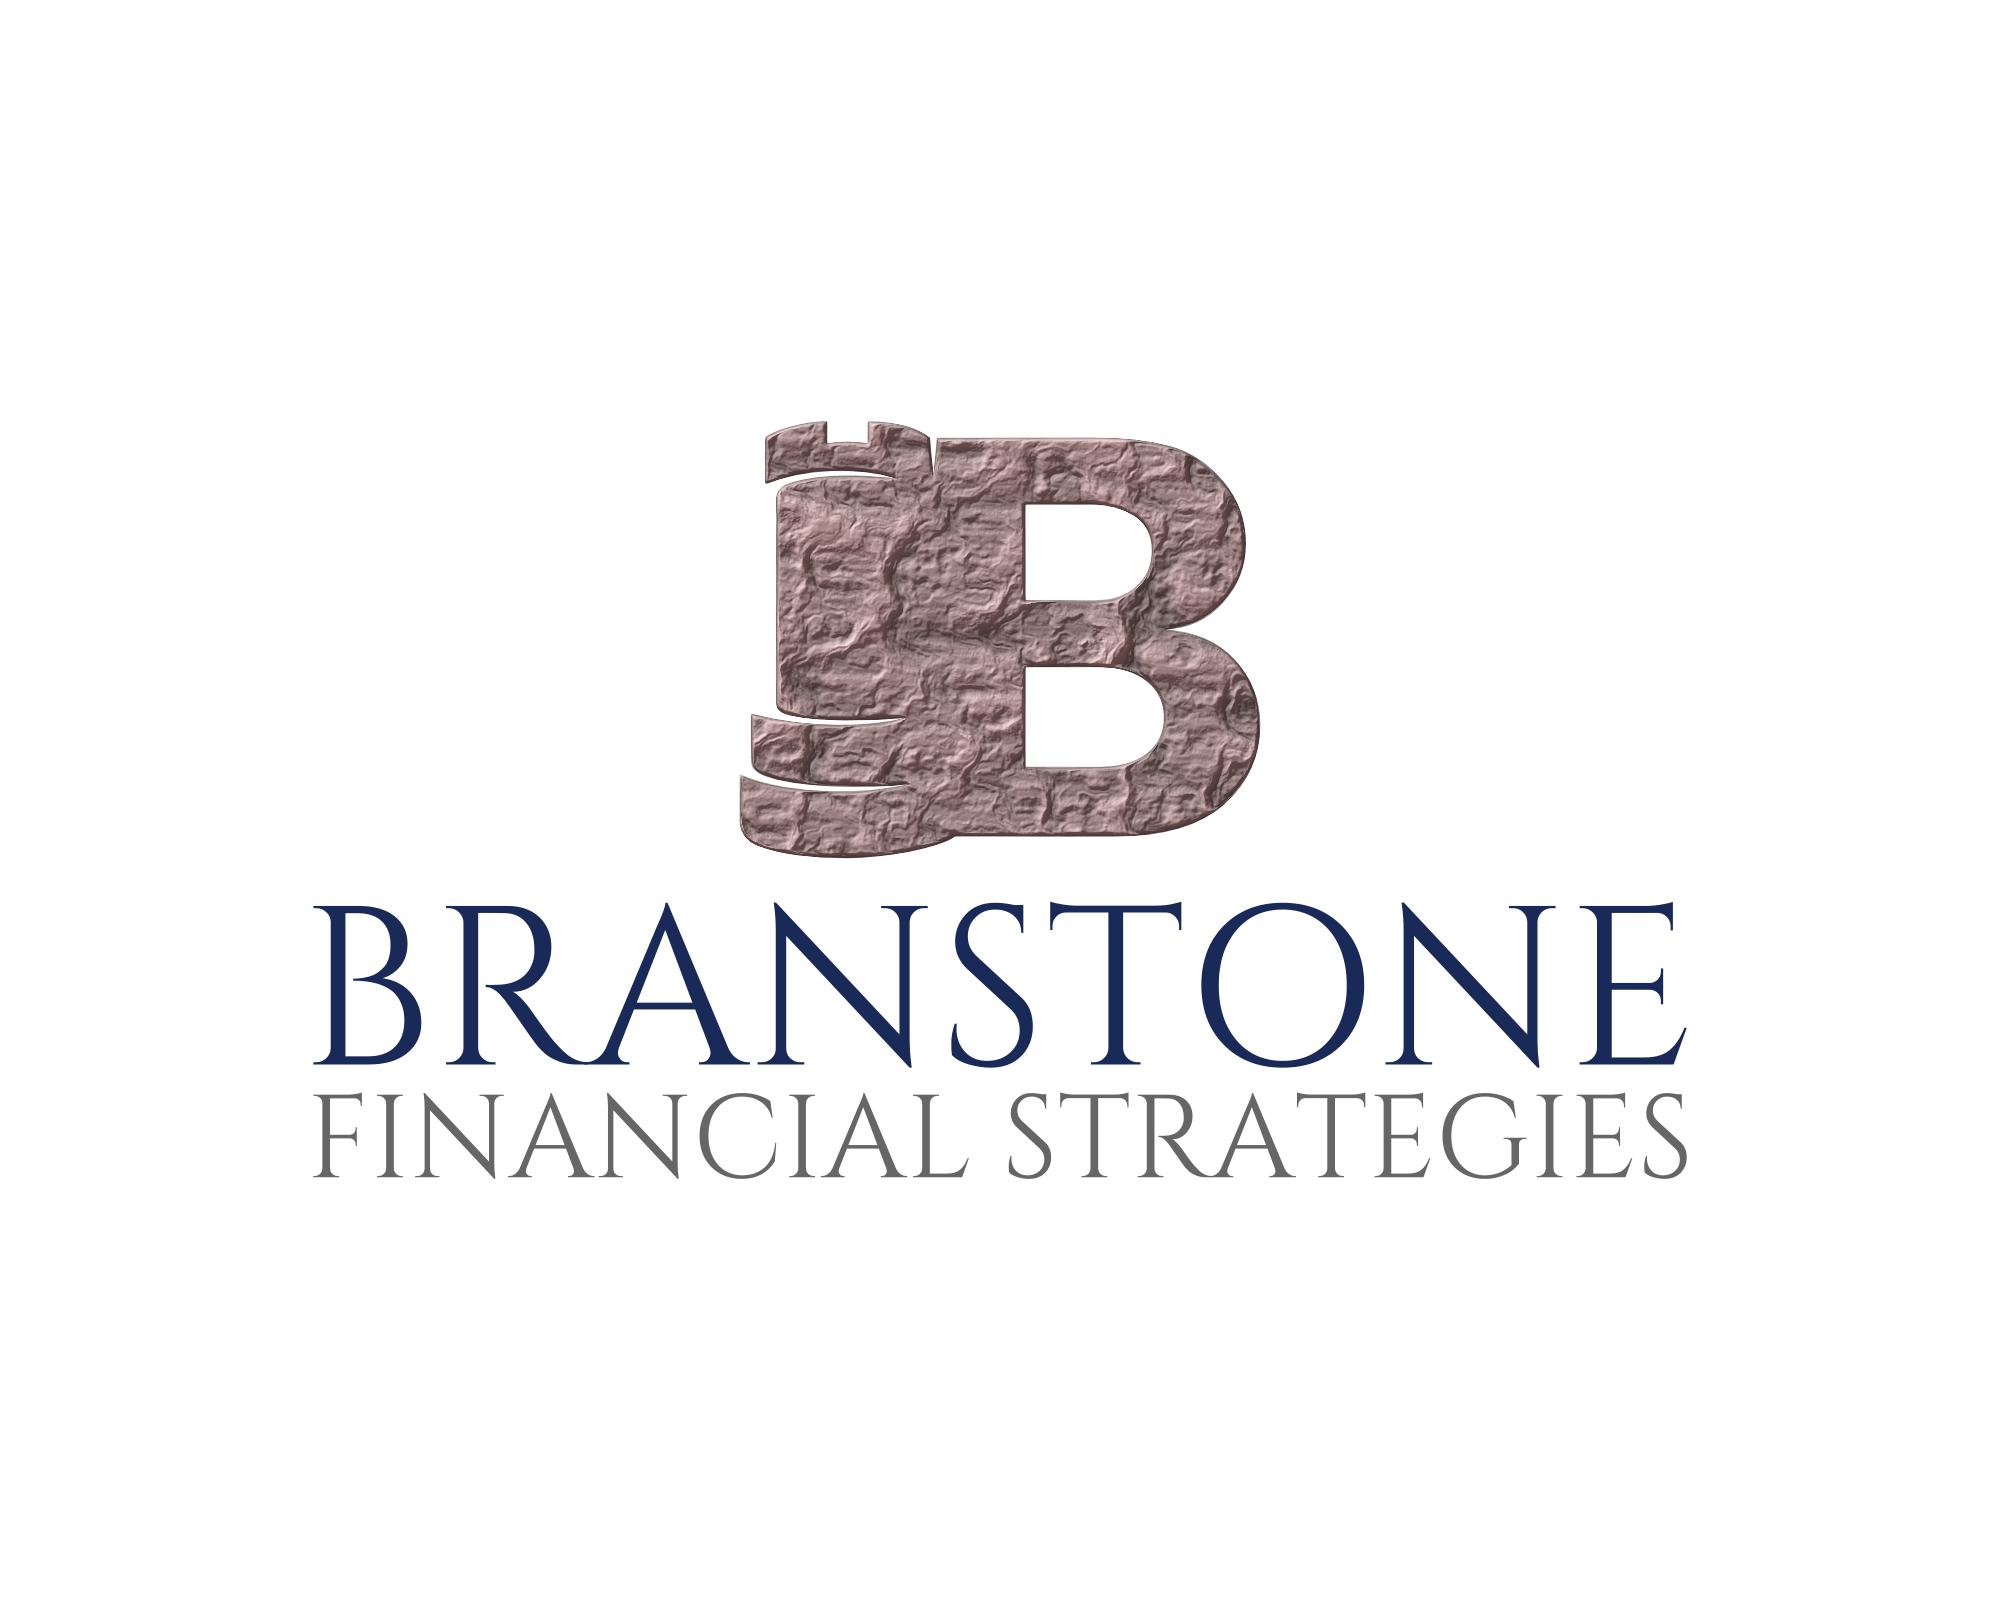 Logo Design by explogos - Entry No. 349 in the Logo Design Contest Inspiring Logo Design for Branstone Financial Strategies.